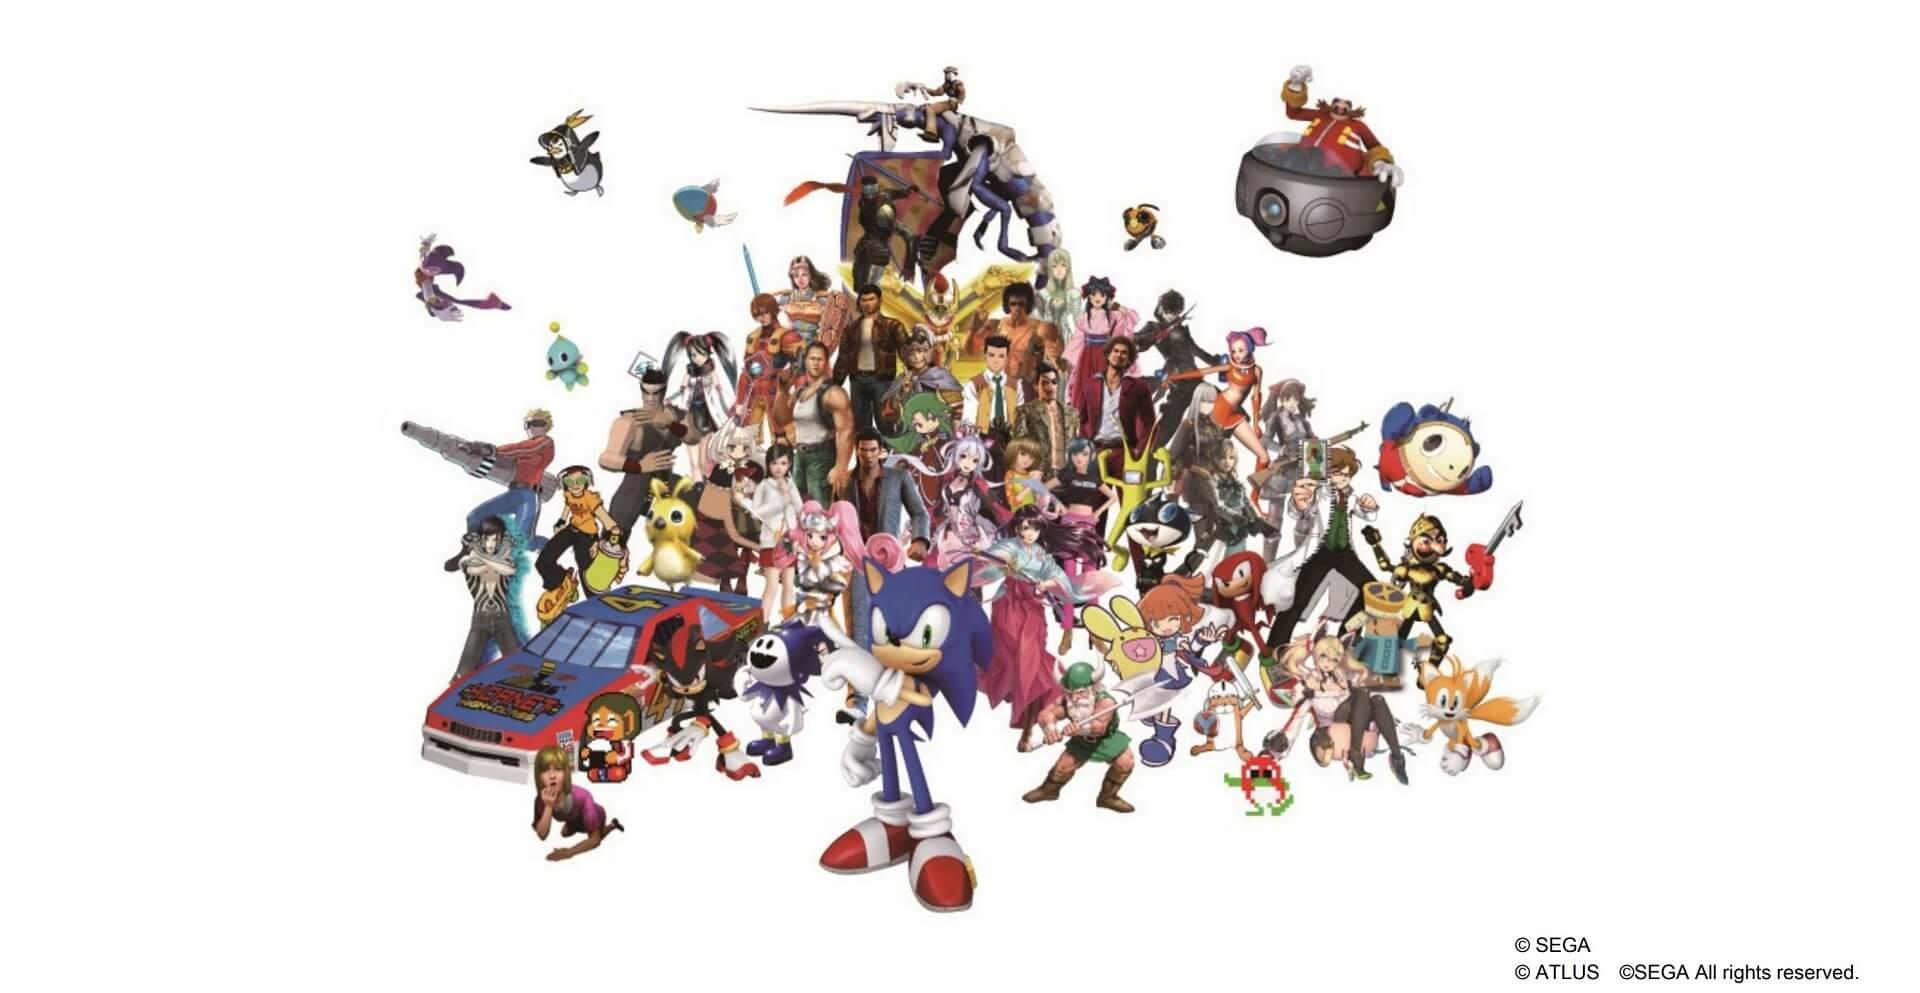 Sega bringt eventuell Klassiker zurück